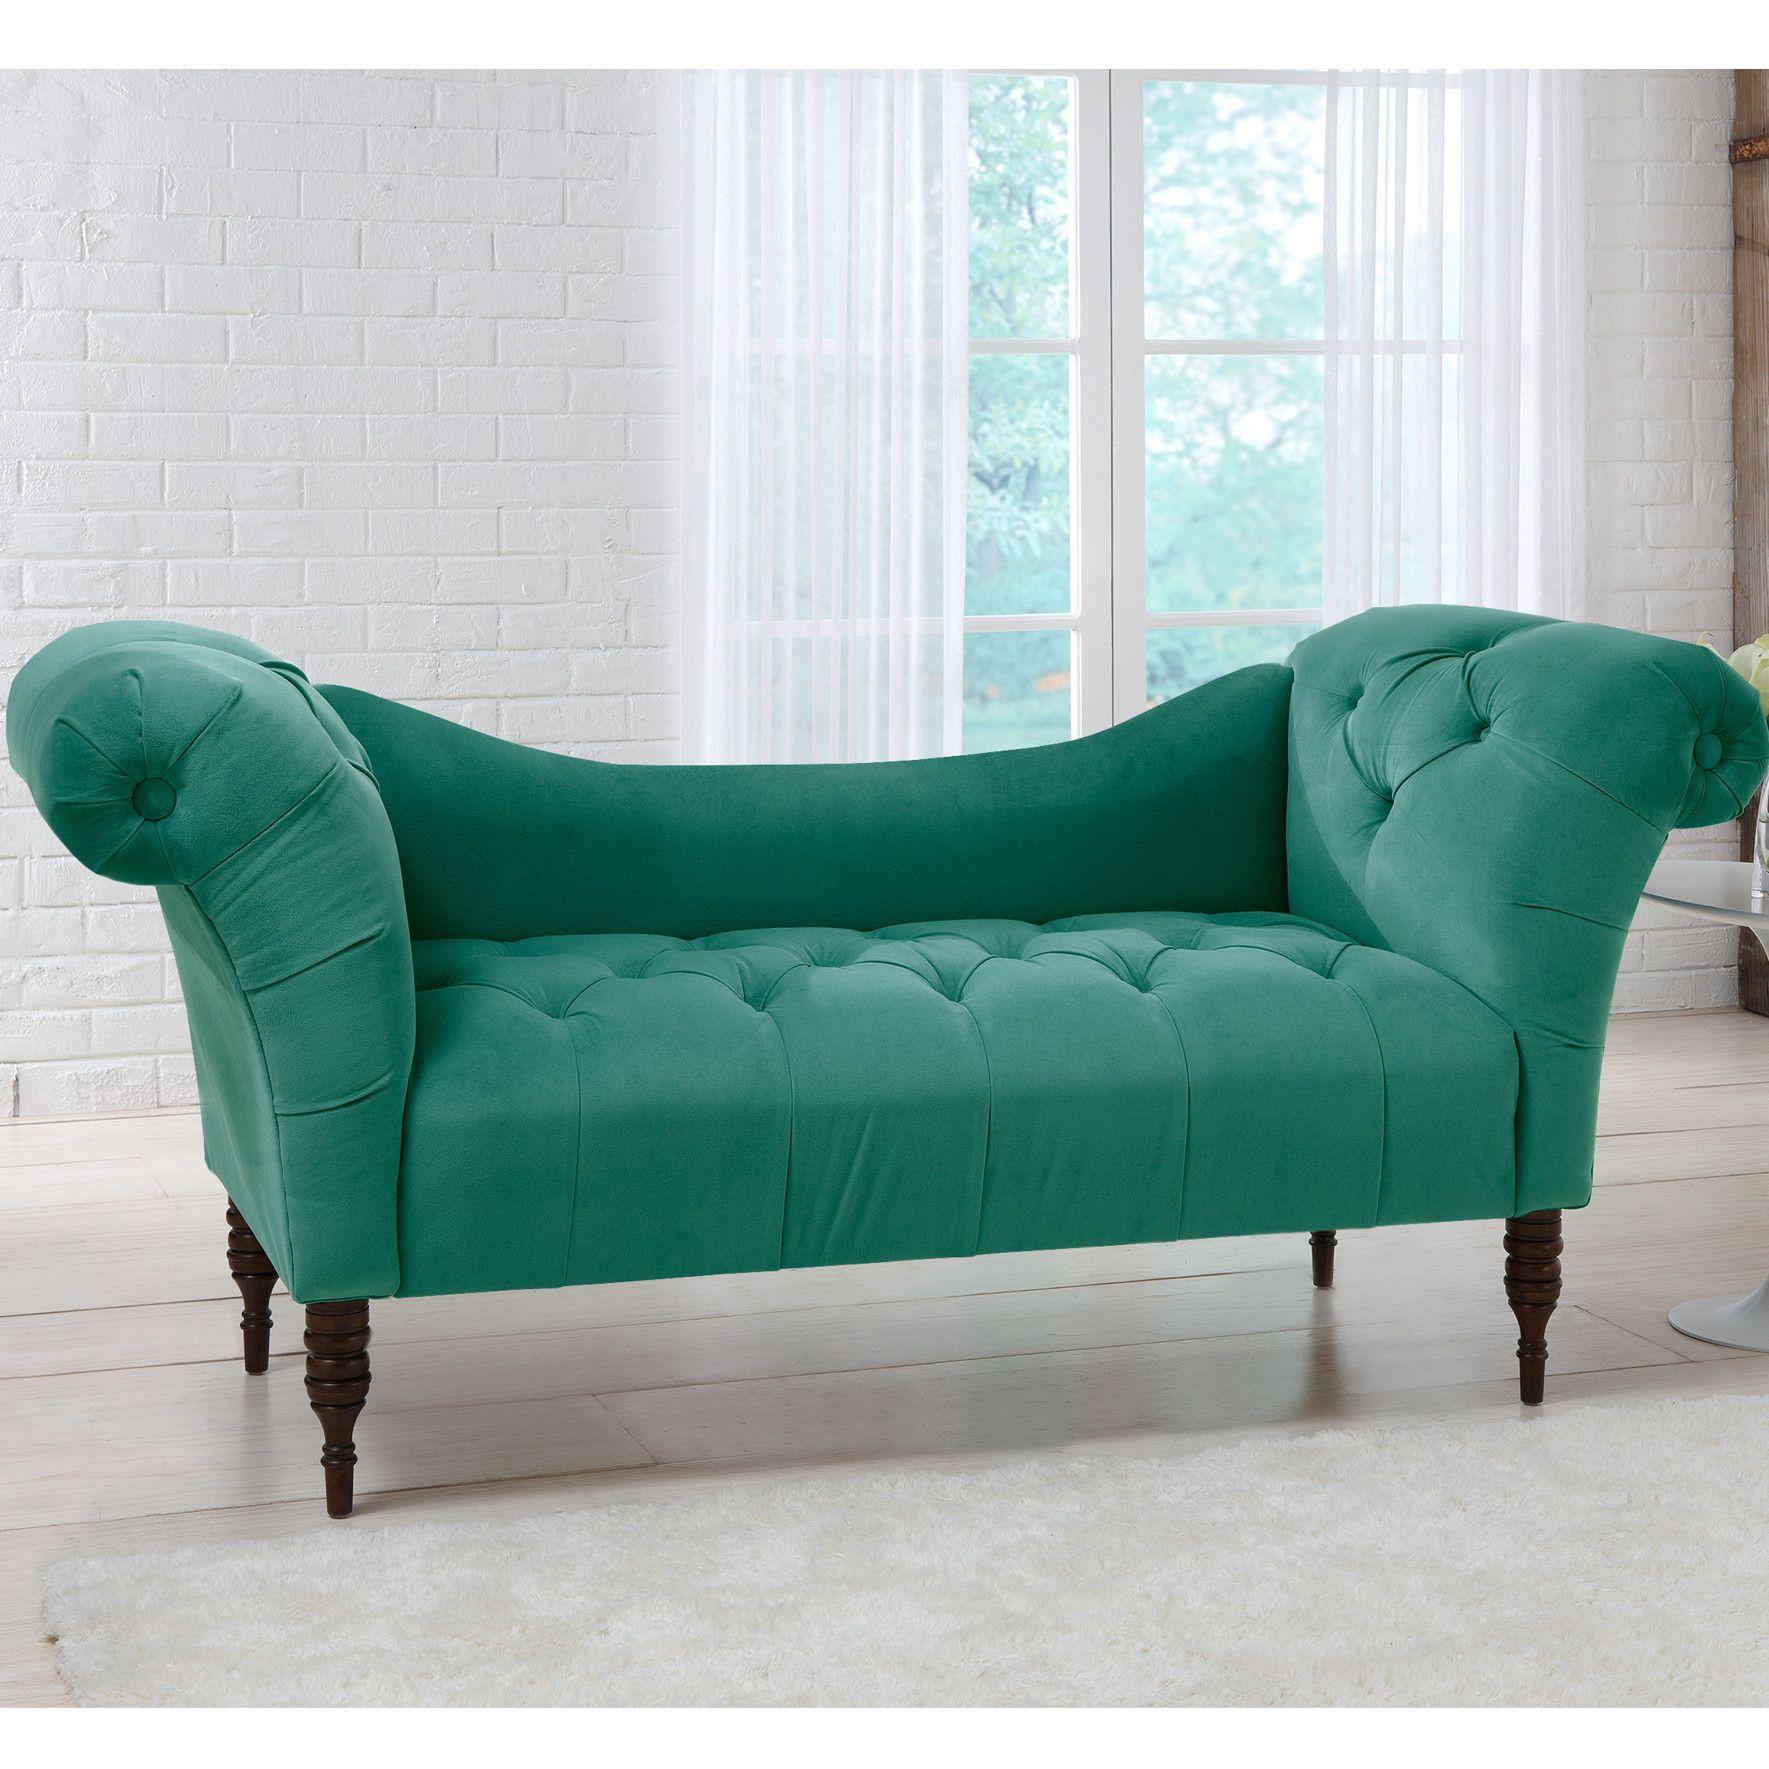 Sensational Not This Color Skyline Furniture Chaise Lounge Reviews Creativecarmelina Interior Chair Design Creativecarmelinacom